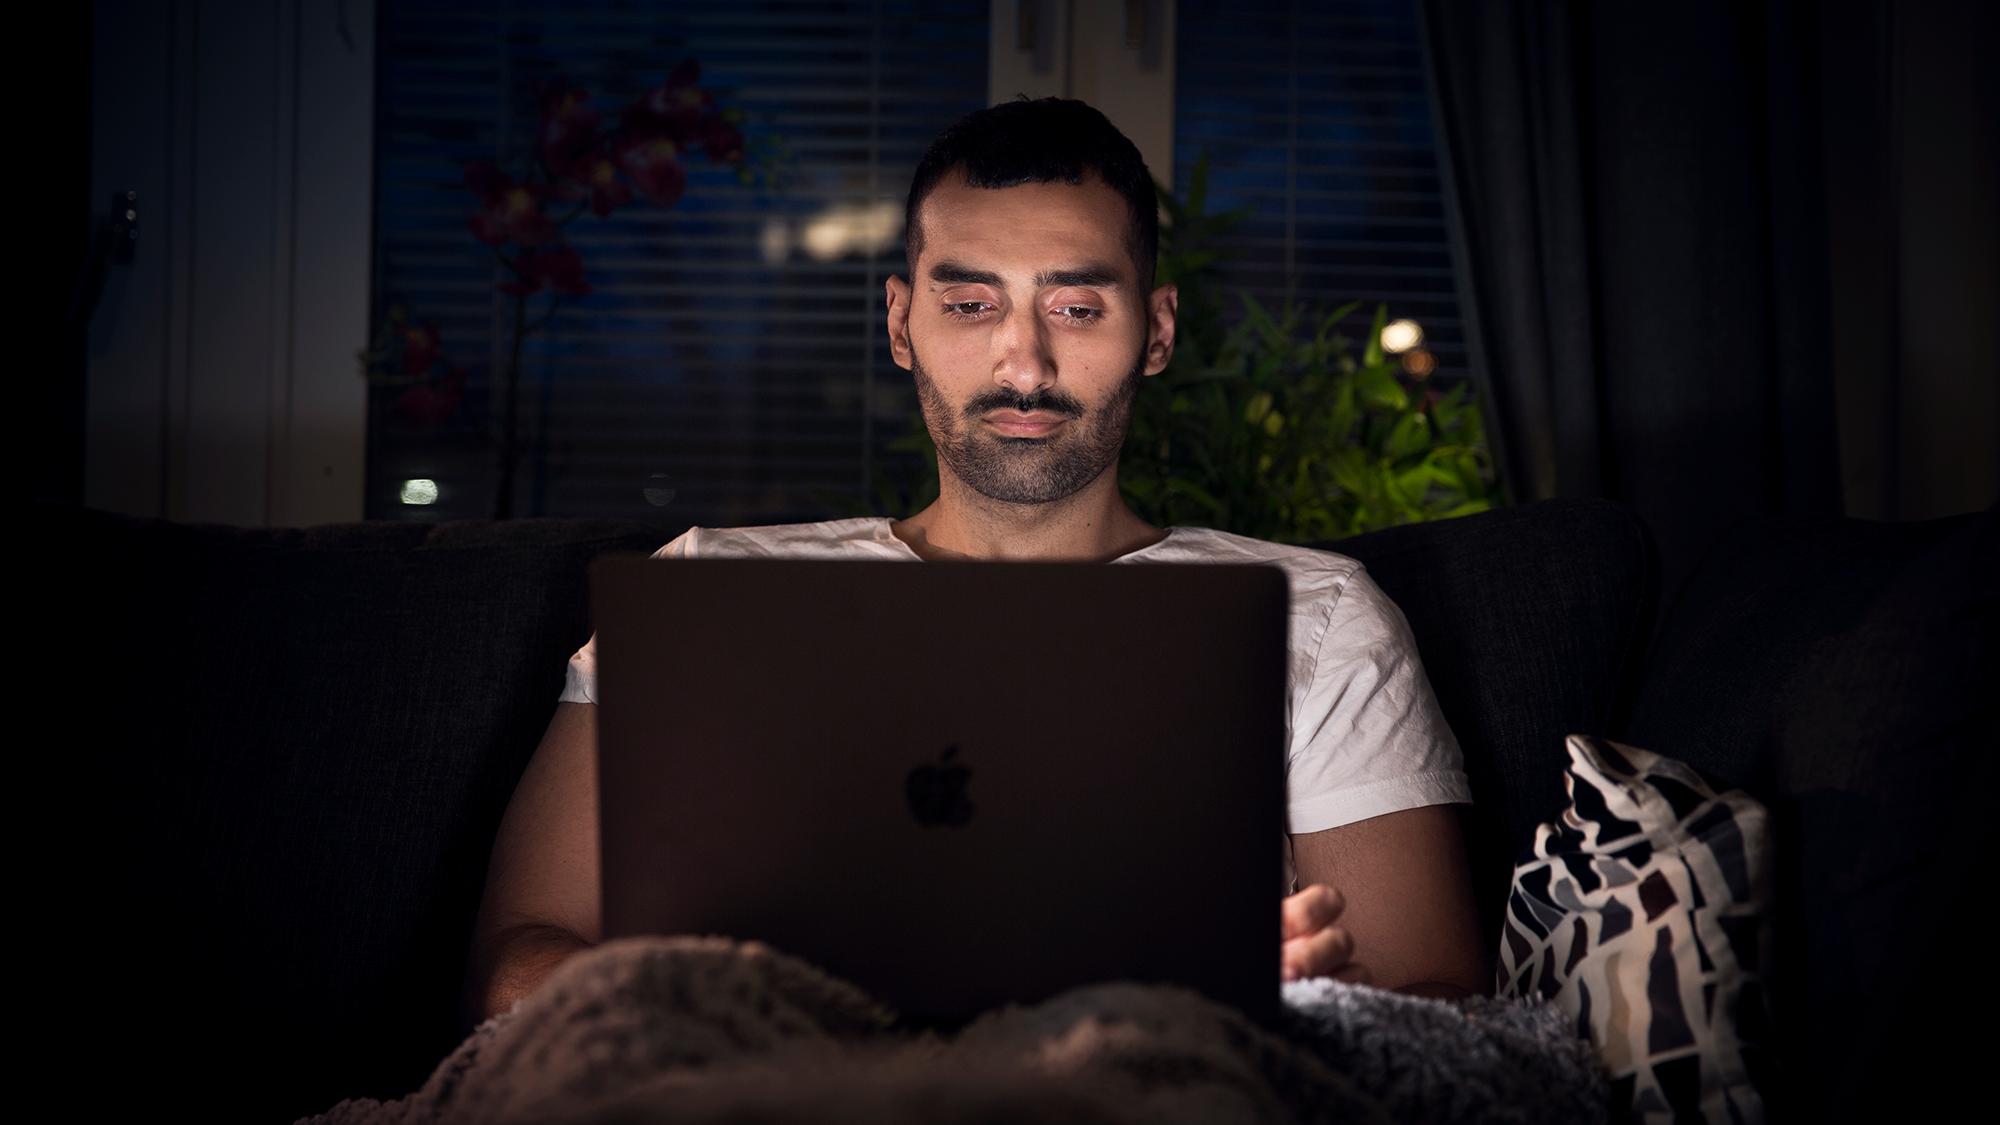 Ahmed Jalal sitter i soffan med datorn i knät